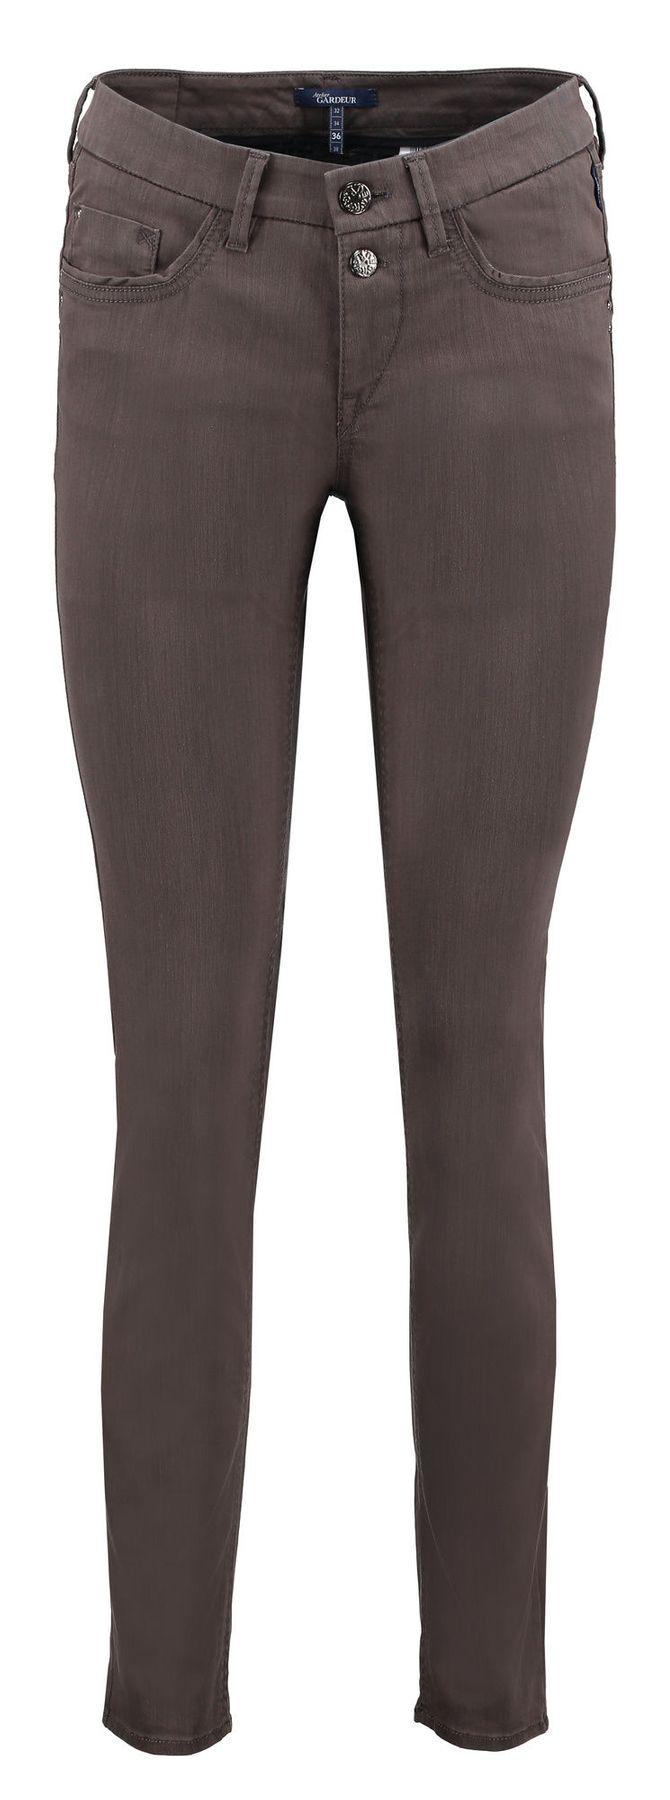 Atelier Gardeur - Super Slim Fit - Damen Hose - Zora27 (061882) – Bild 6